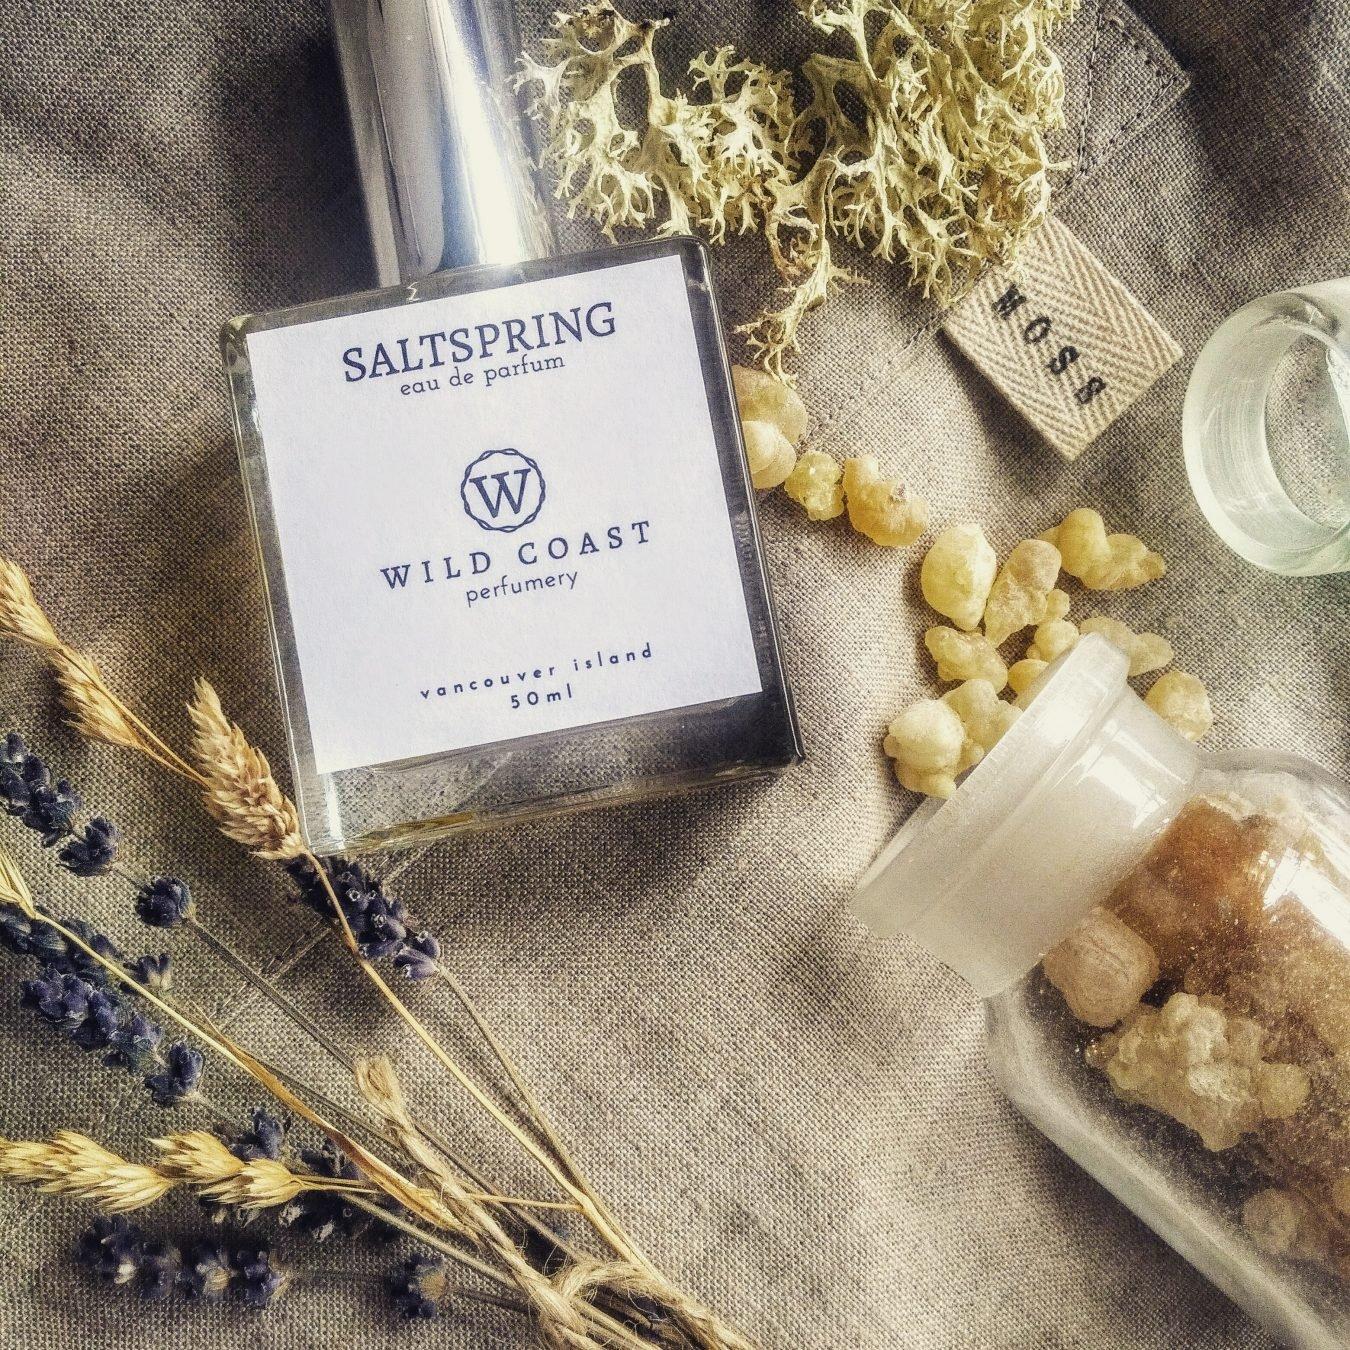 Wild Coast Perfumery Creates B.C. Scents